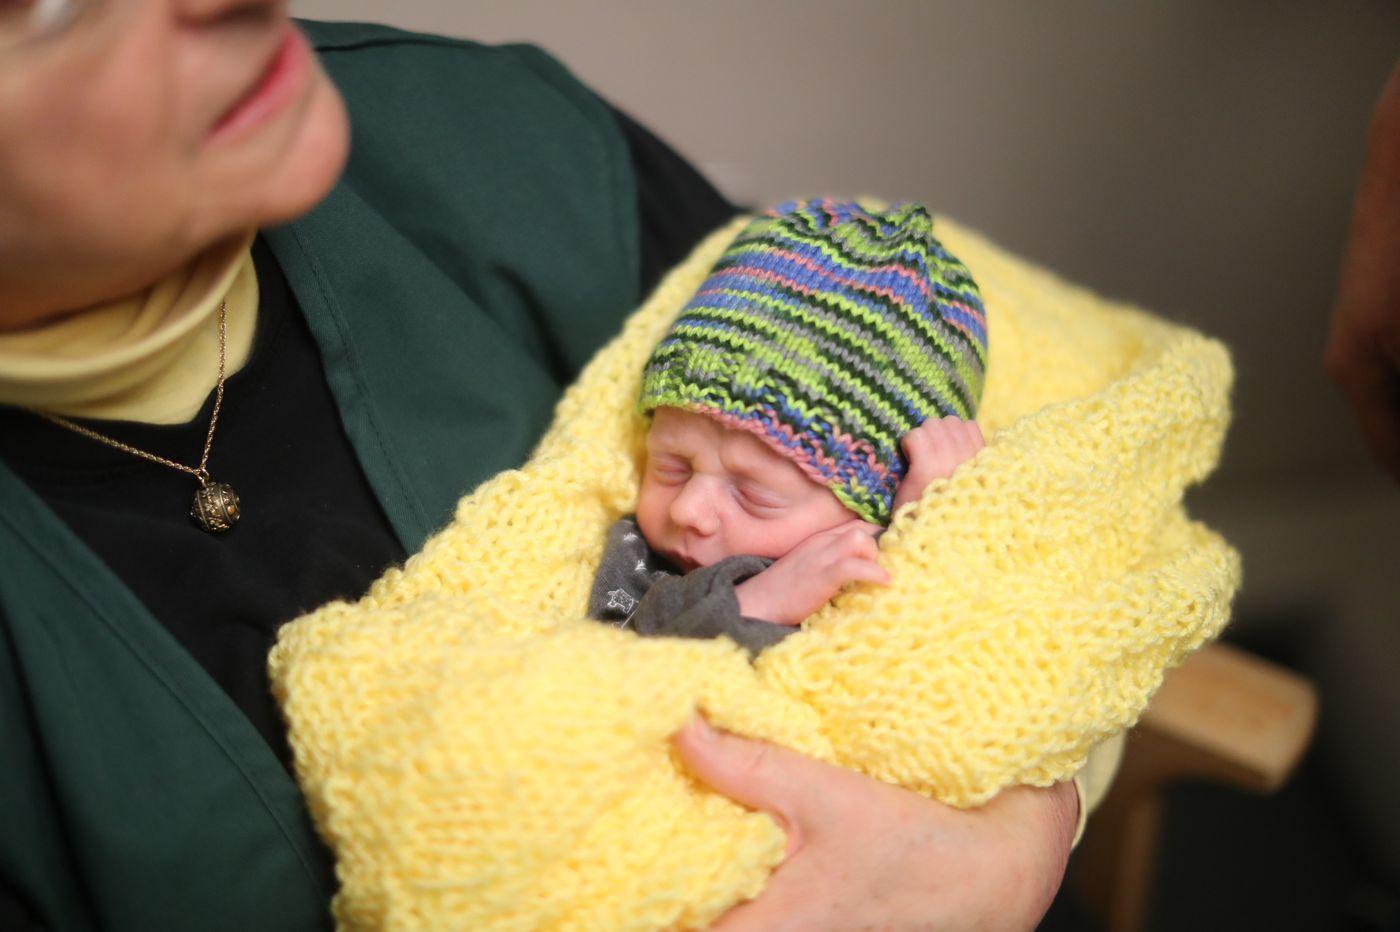 Pa. Supreme Court's dehumanizing decision puts children at risk | Christine Flowers